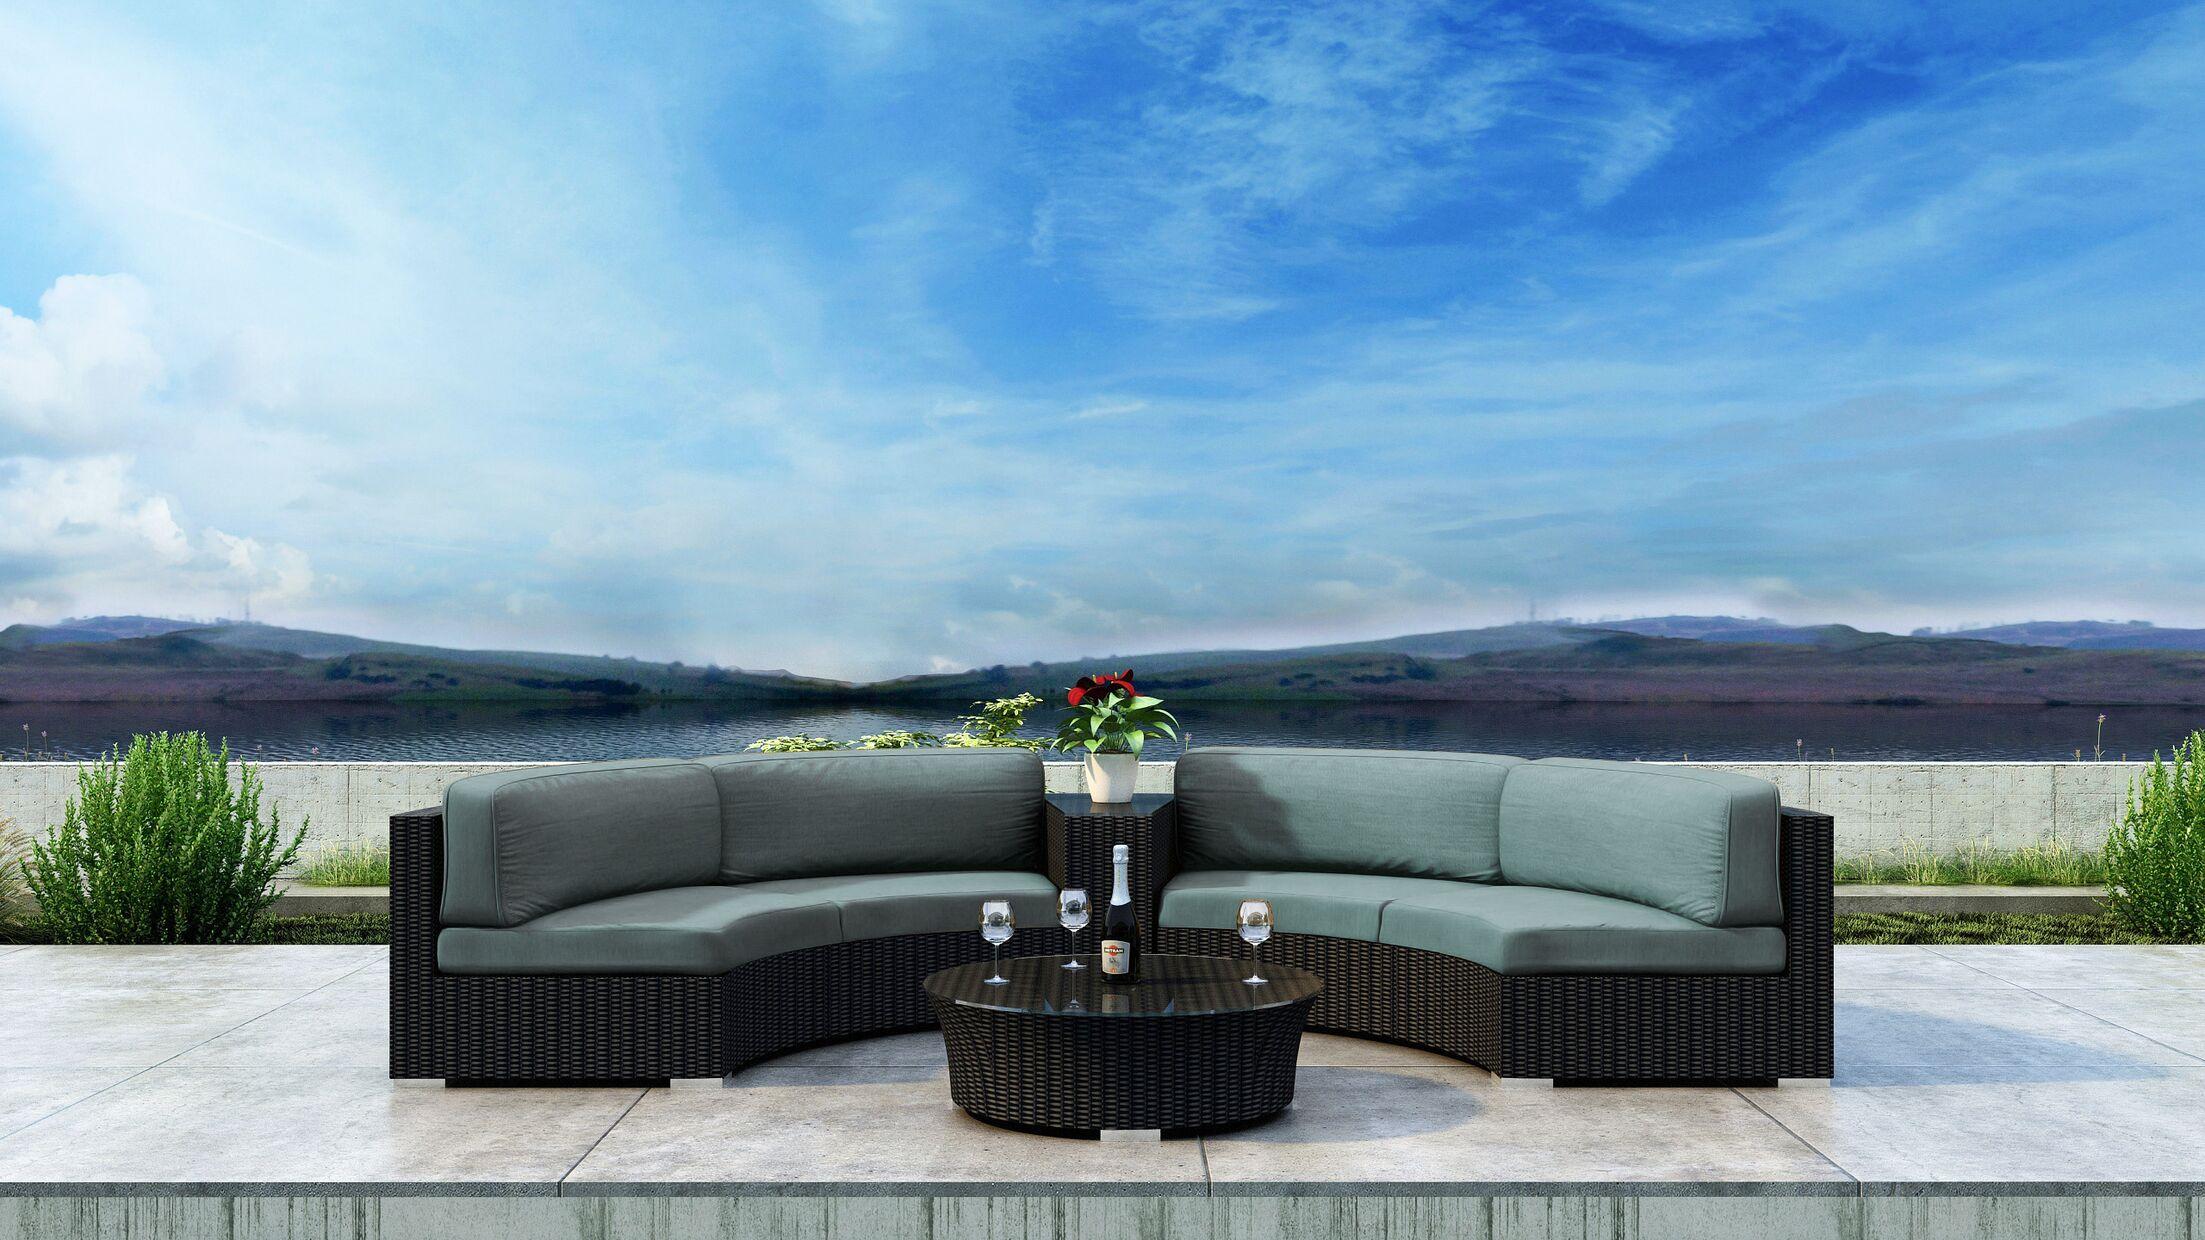 Glendale 4 Piece Sectional Set with Sunbrella Cushion Cushion Color: Canvas Spa